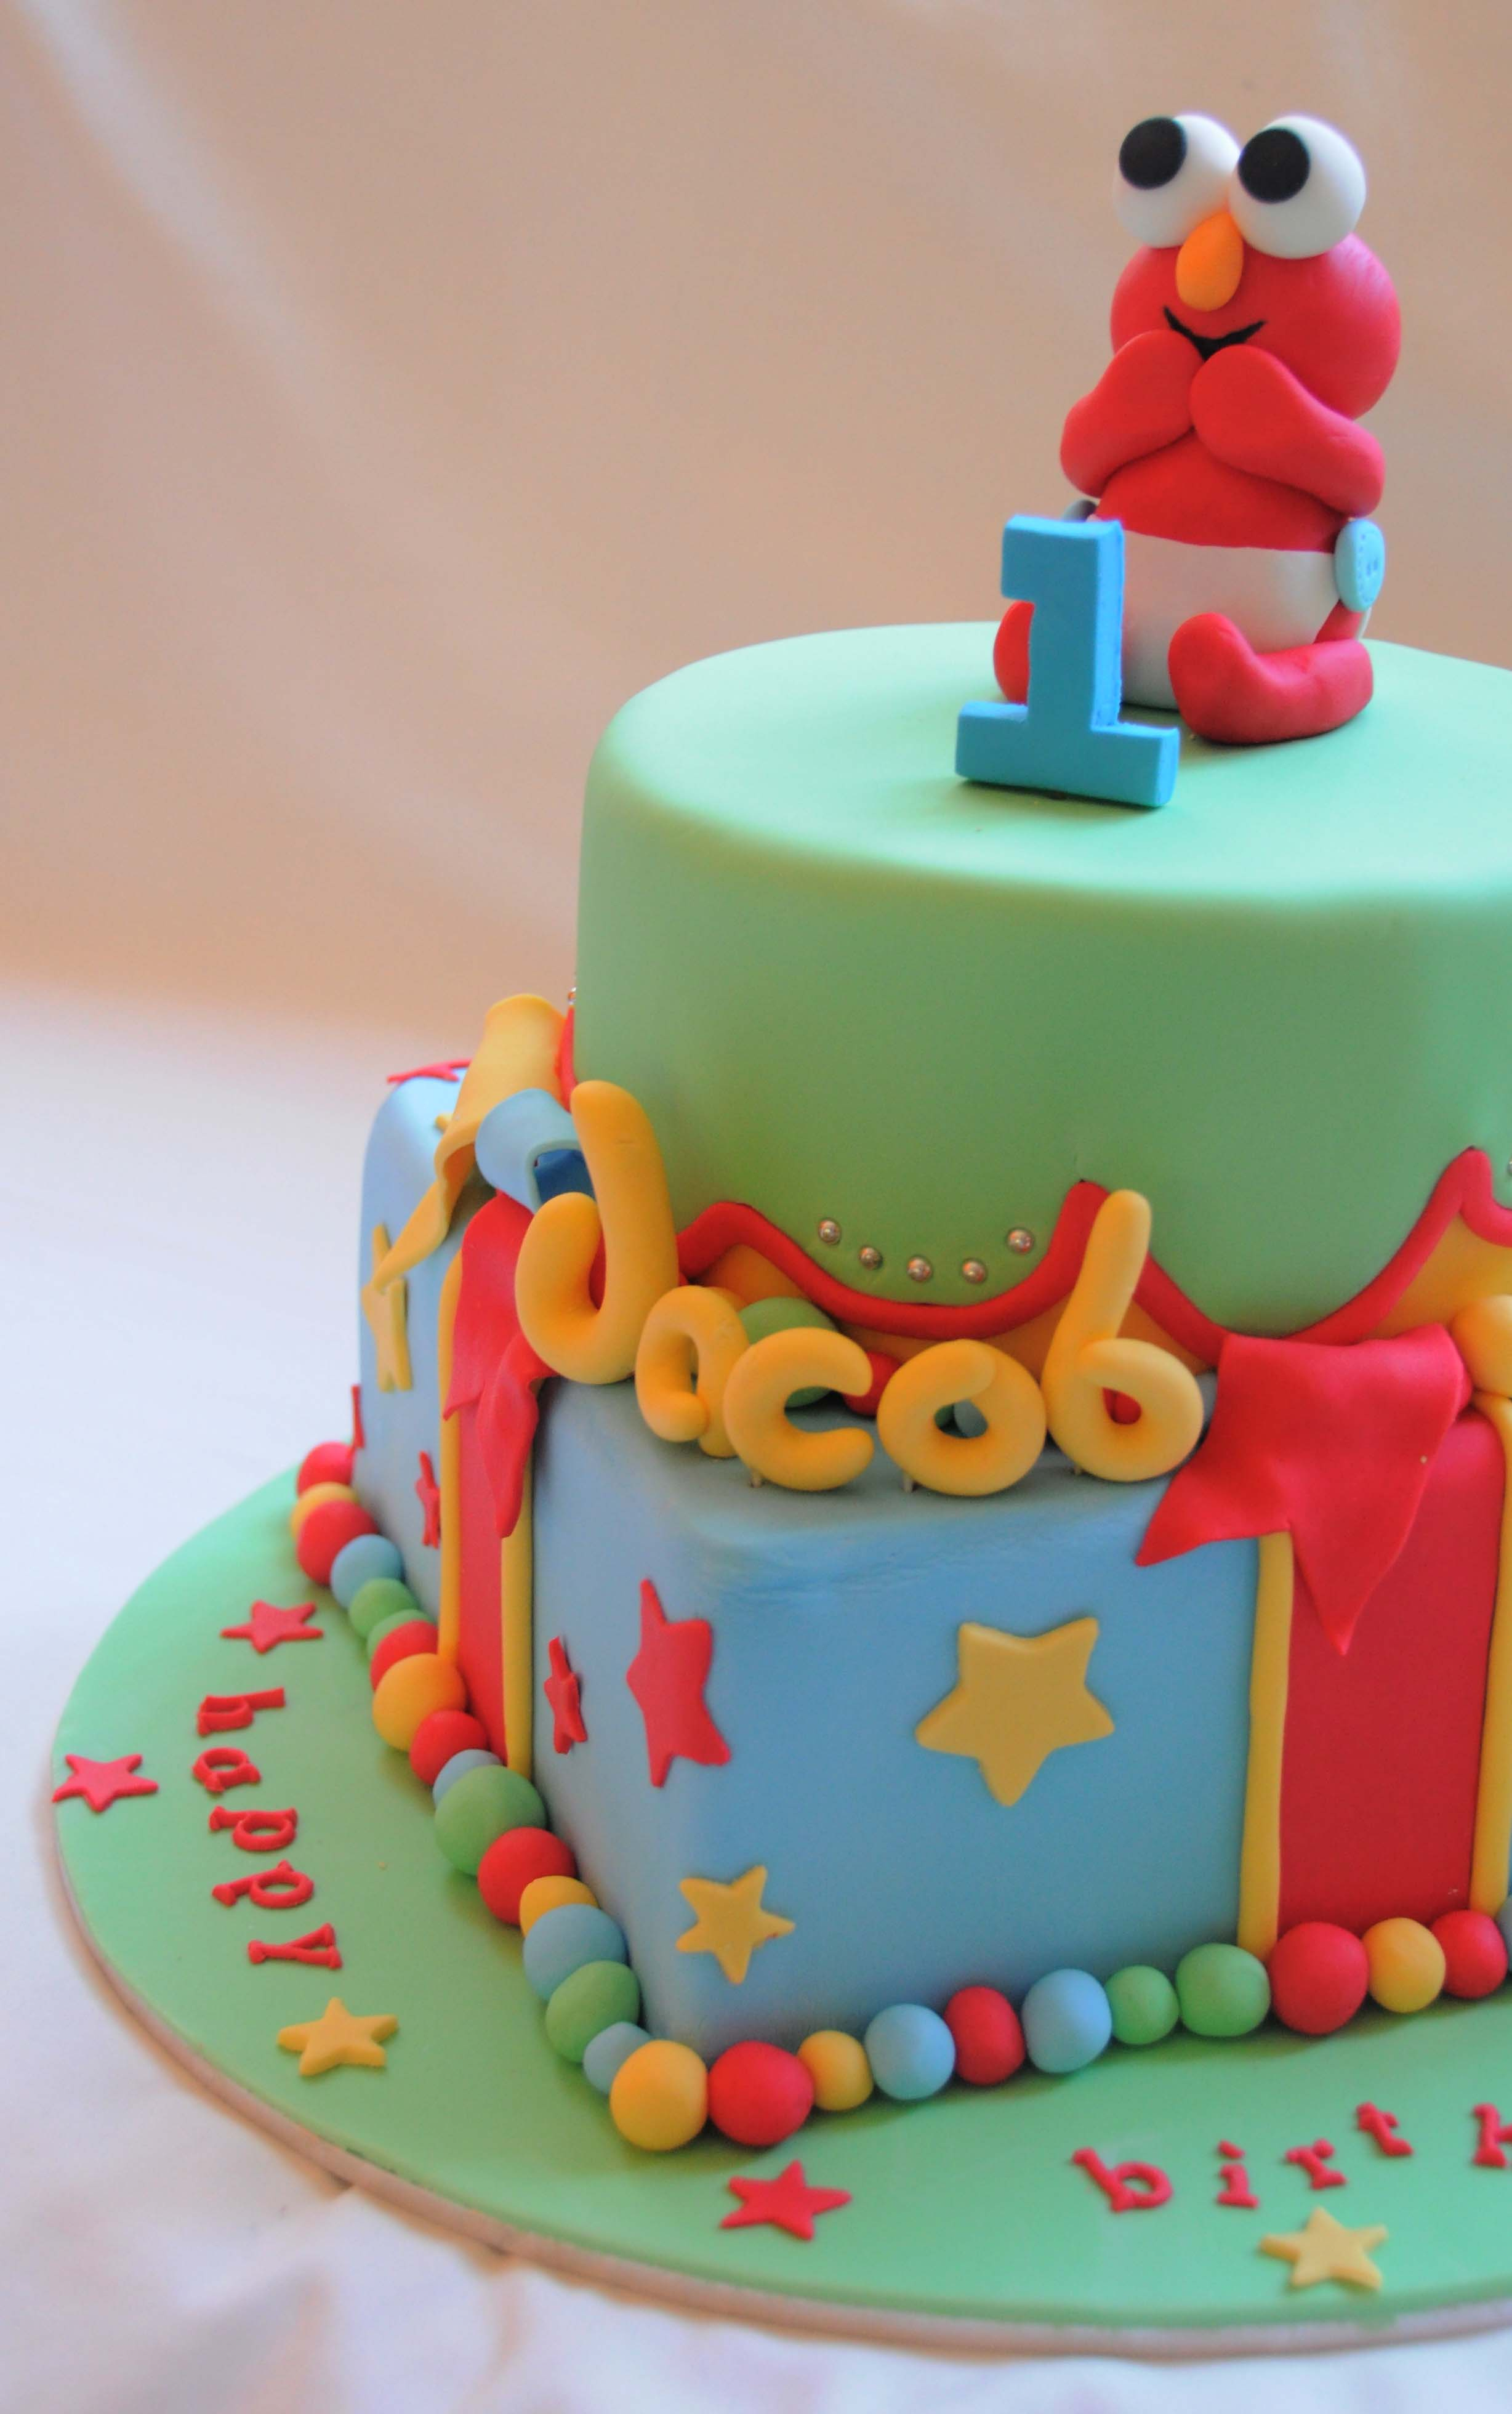 Elmo Cake Its A Thing